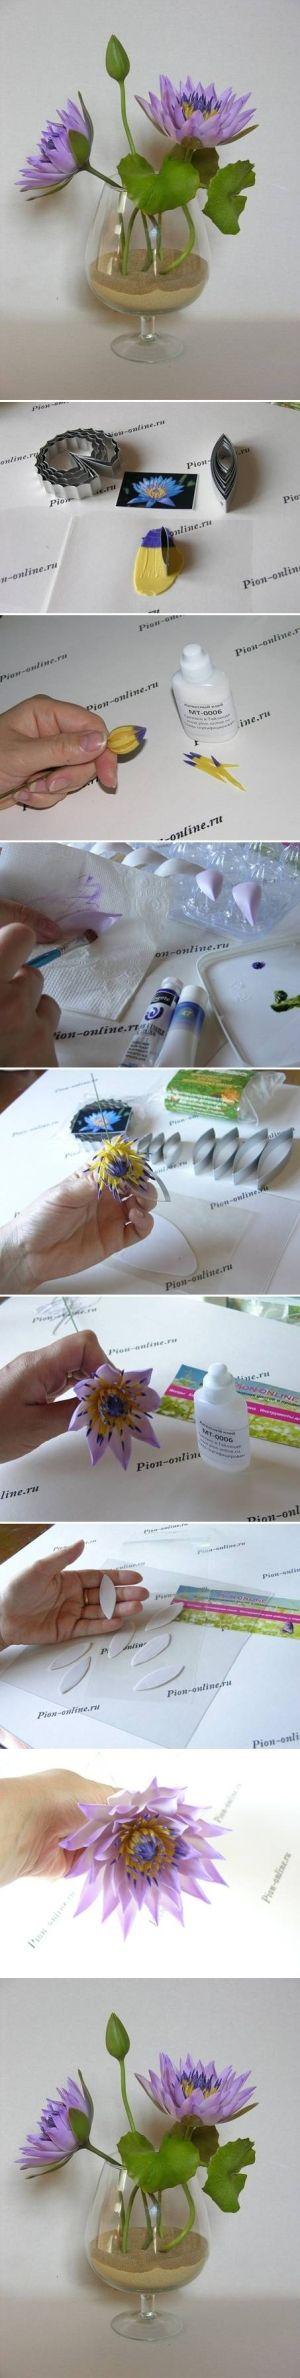 DIY Polymer Clay Lotus Flower DIY Polymer Clay Lotus Flower by diyforever